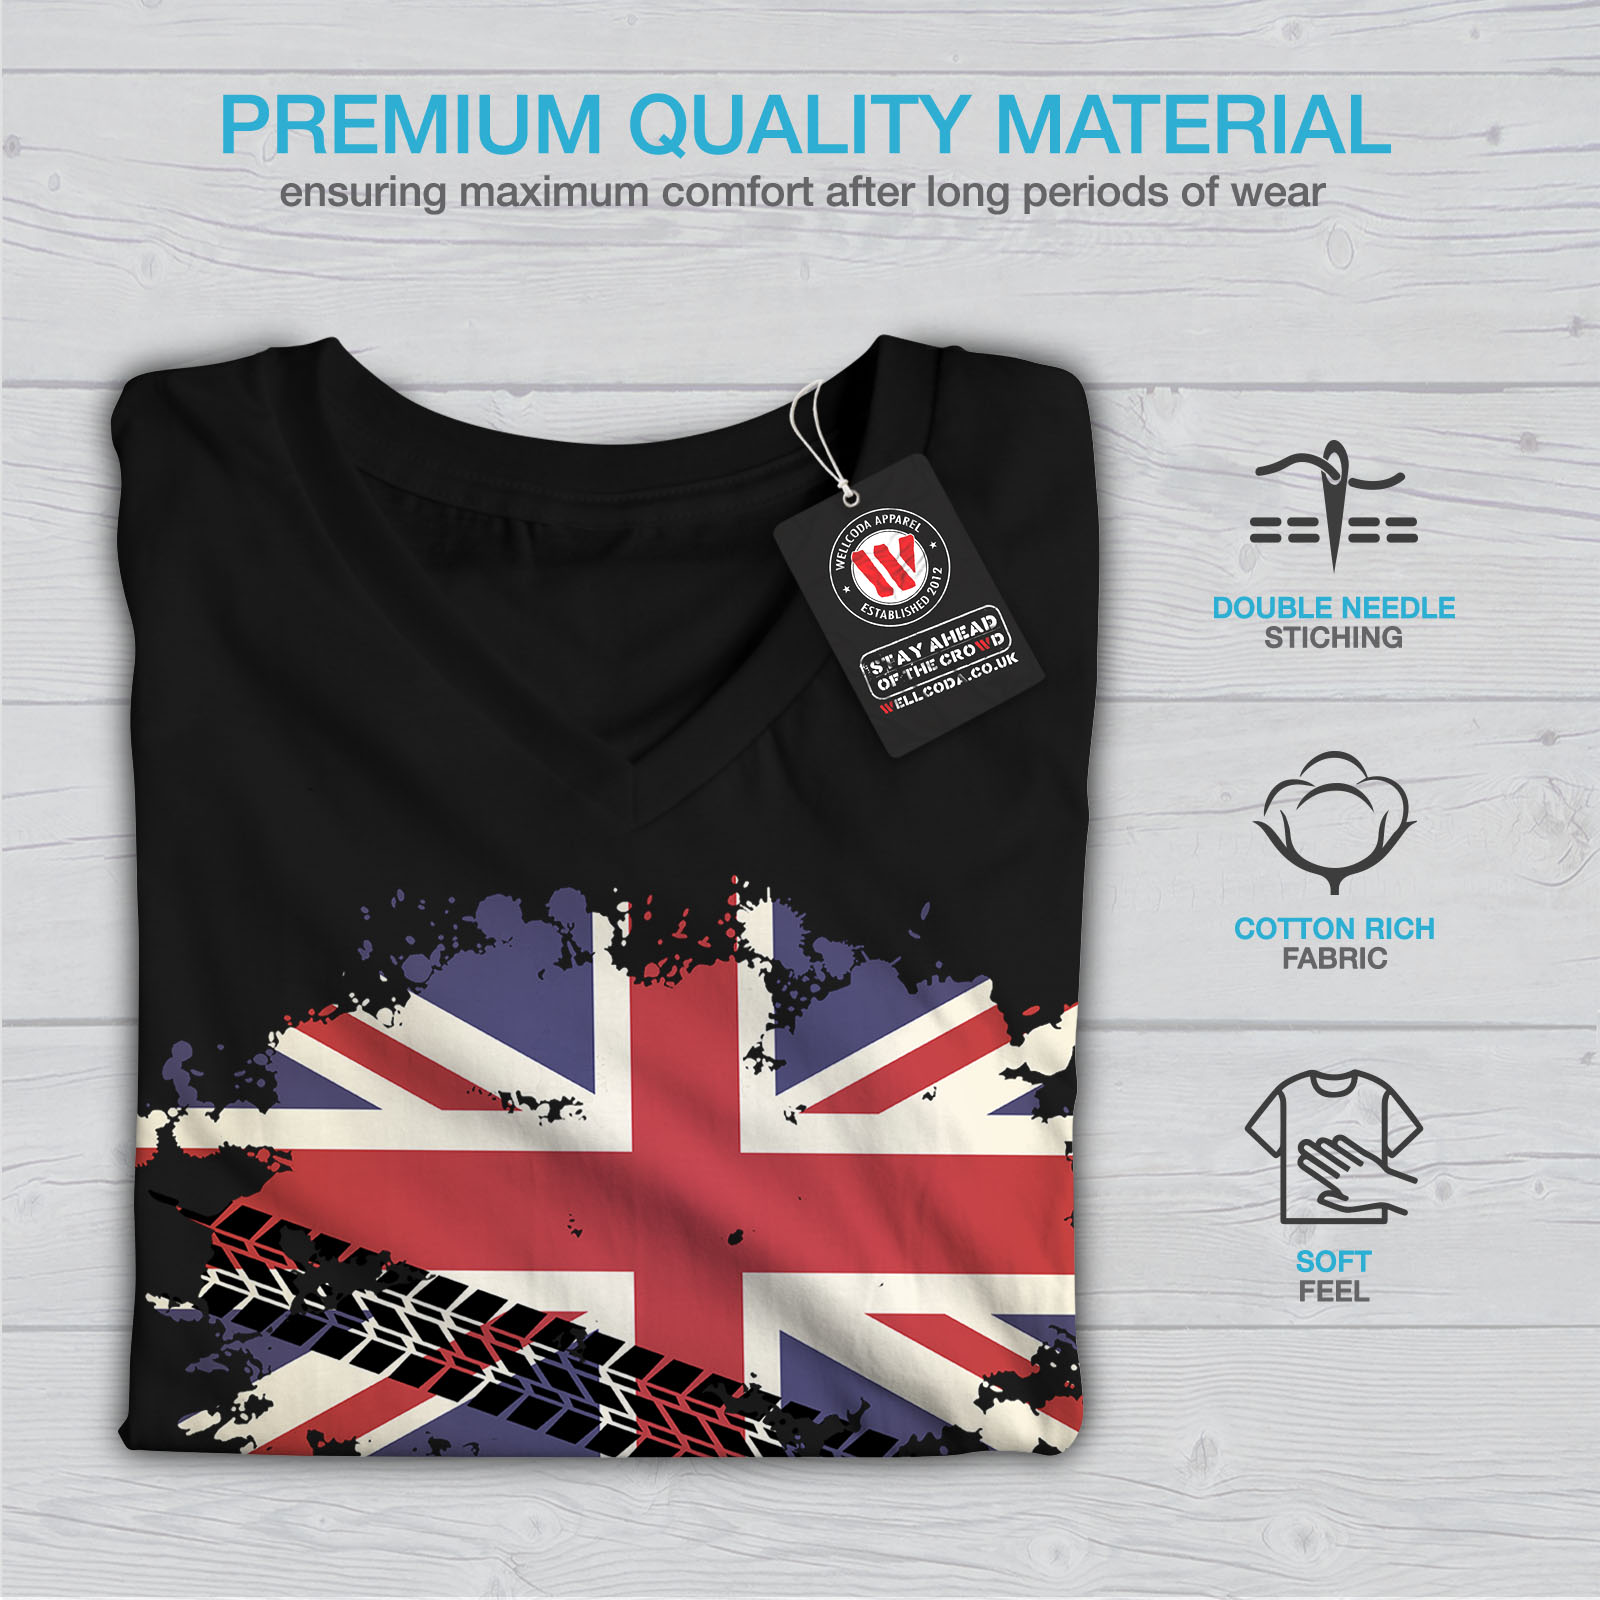 Wellcoda-Union-Jack-Drapeau-Femme-T-Shirt-col-V-la-Grande-Bretagne-conception-graphique-Tee miniature 5